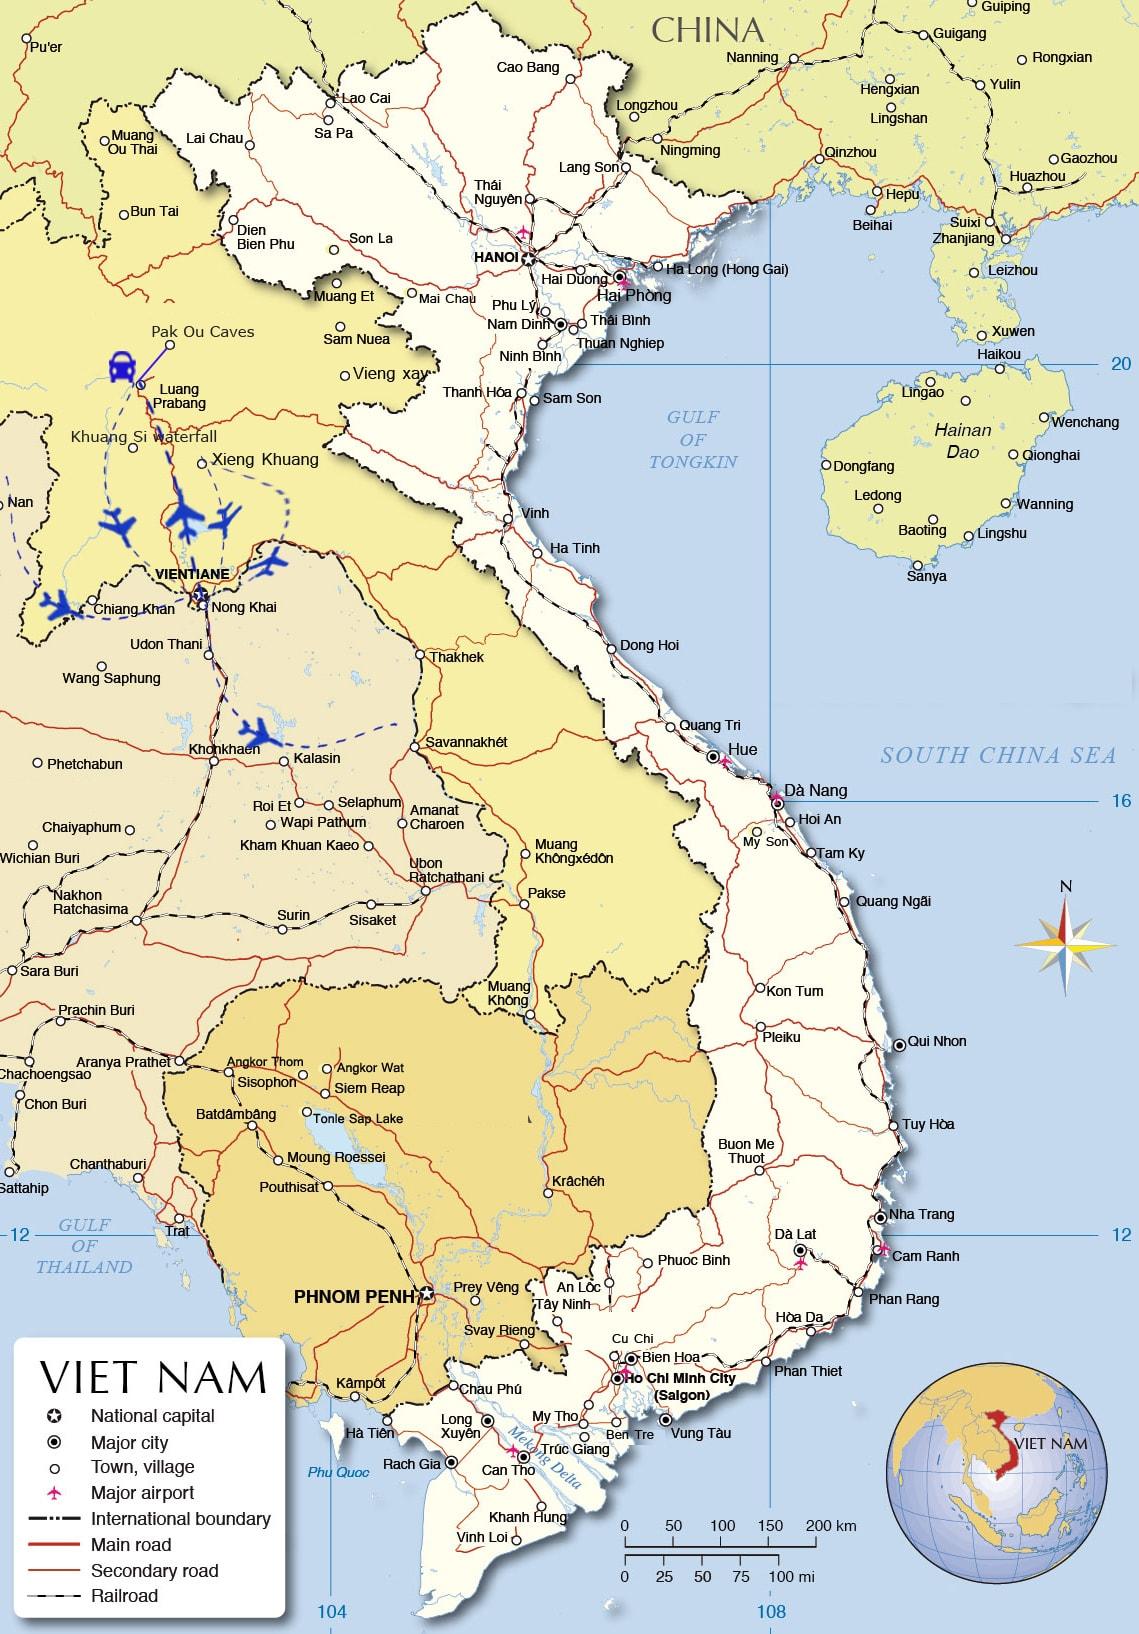 LT05: Treasure of Laos - 6 days / 5 nights map